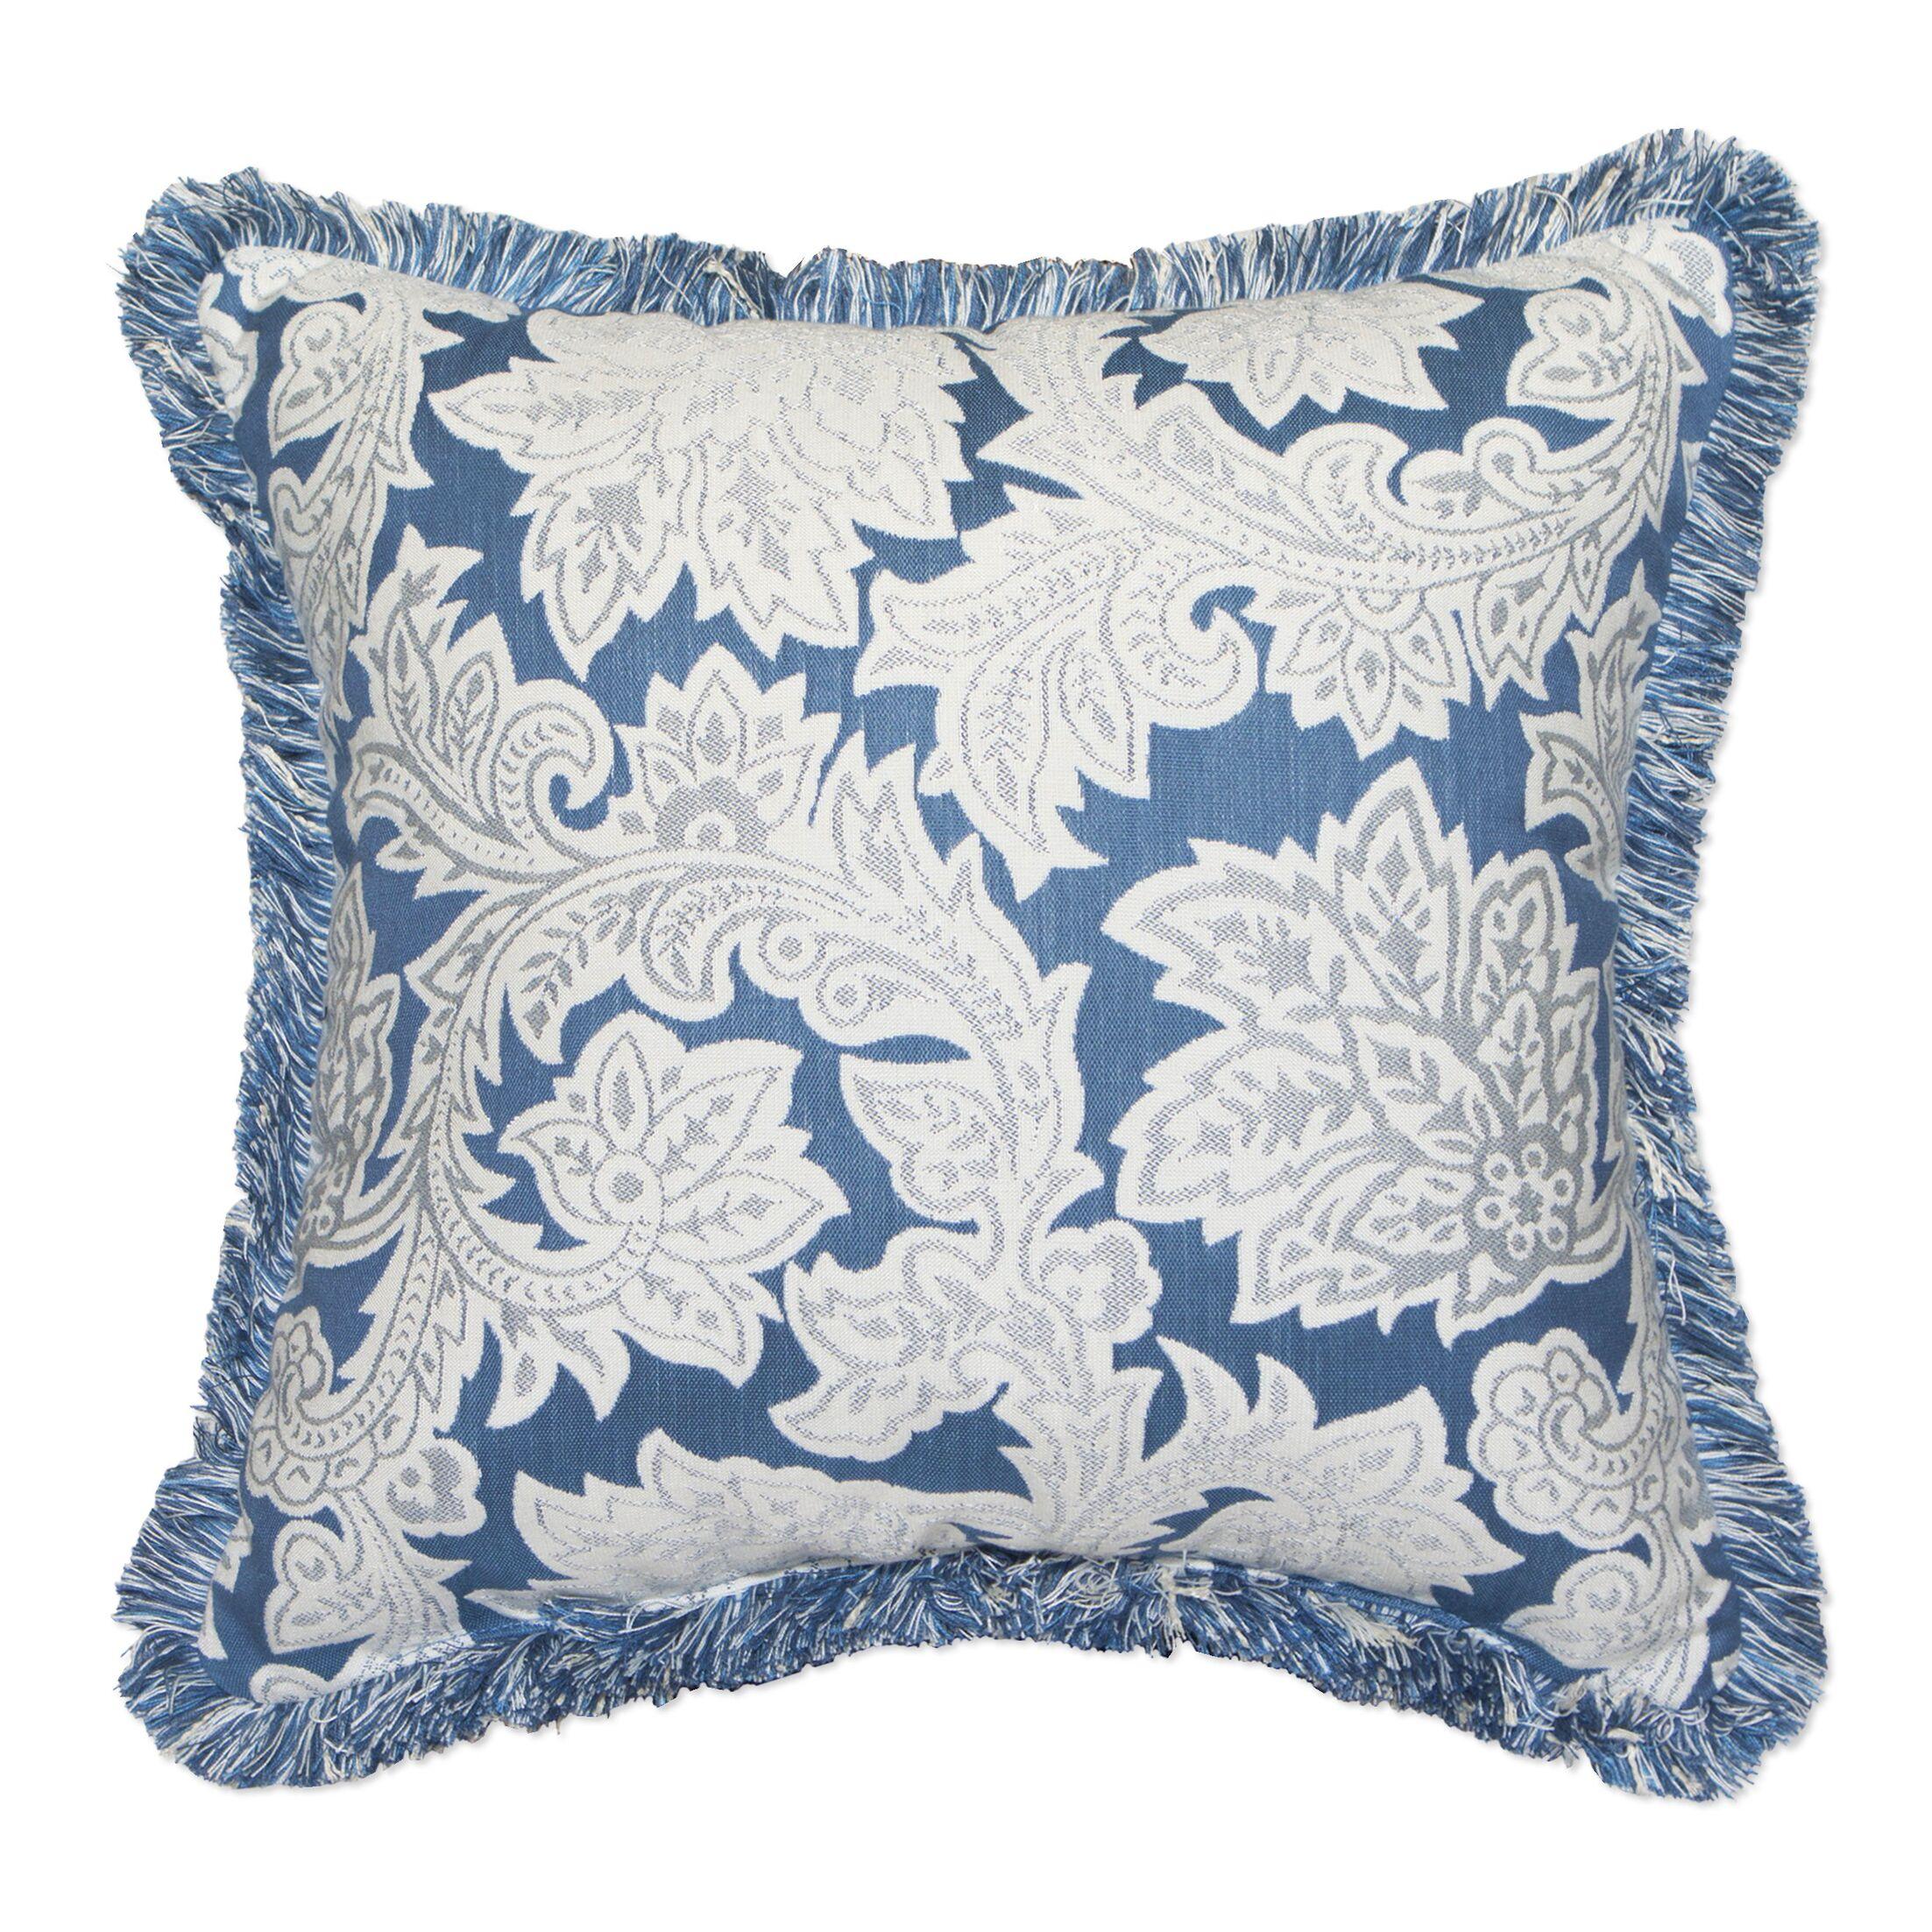 Jacobean Spring Throw Pillow with Fringe